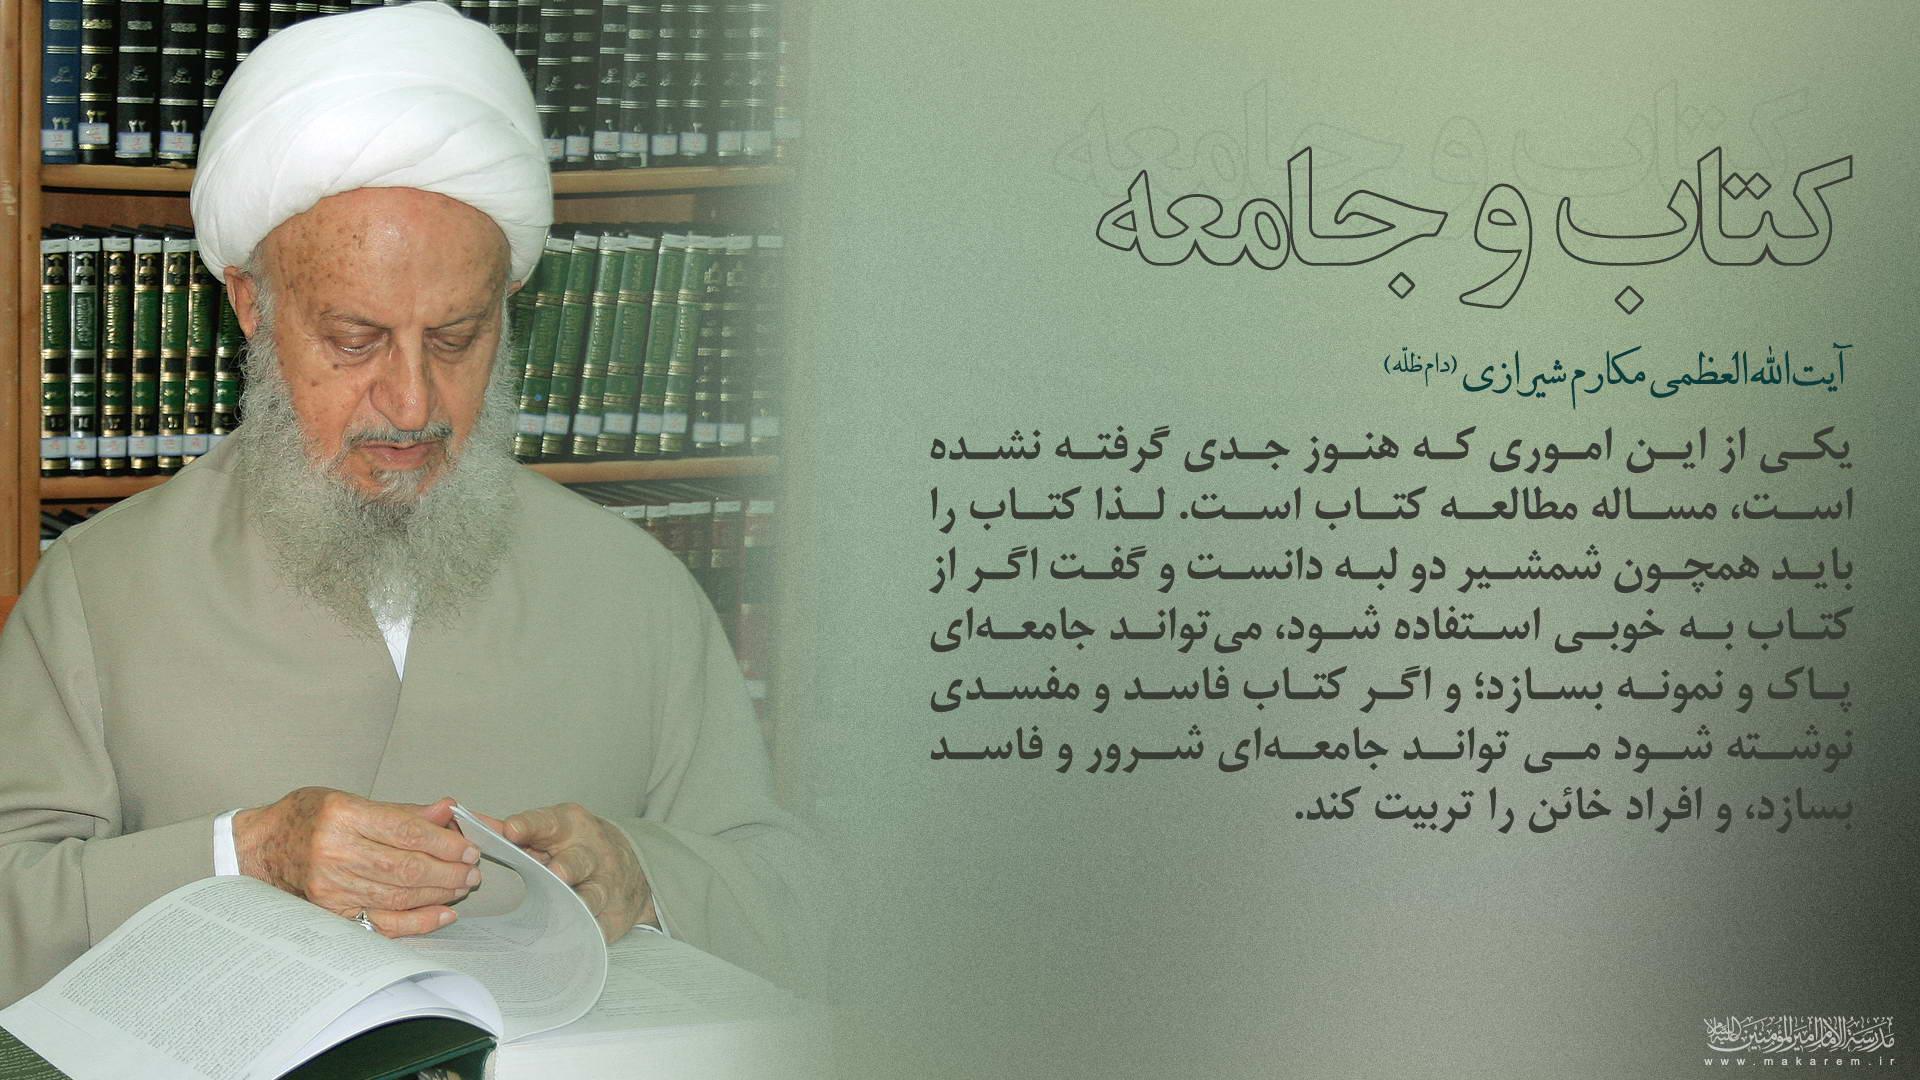 کتاب و جامعه-مدرسه الامام امیر المومنین (ع)